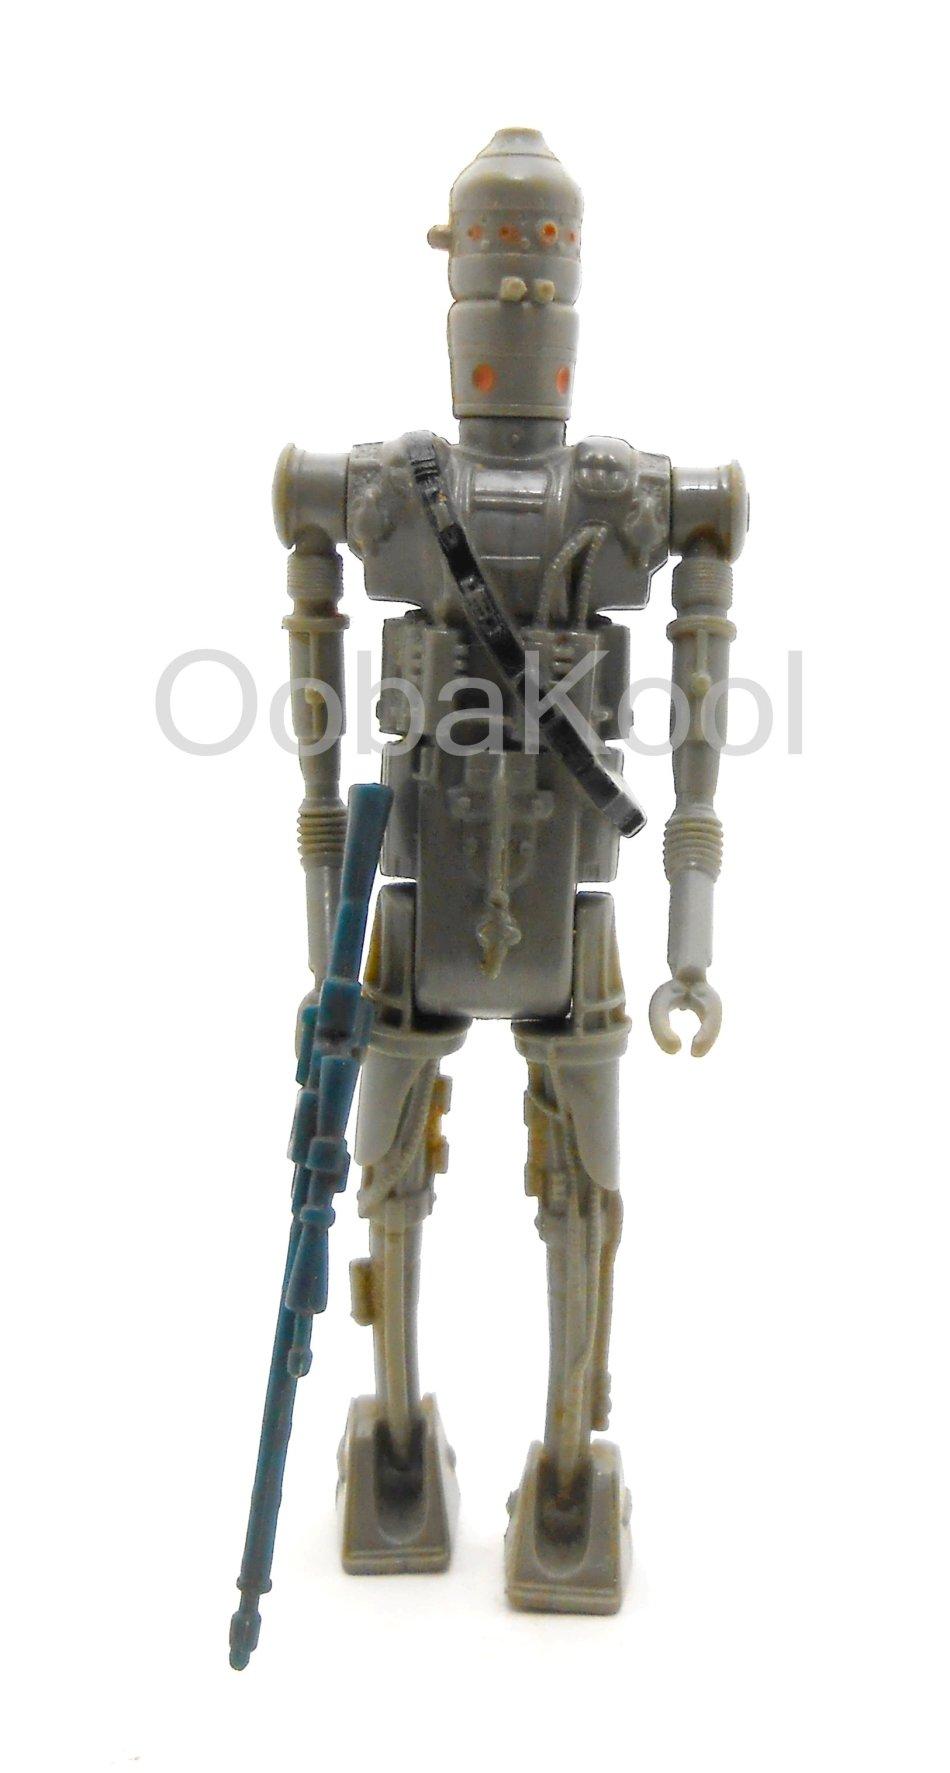 Star Wars Toys 1980s : Vintage toys star wars ig bounty hunter